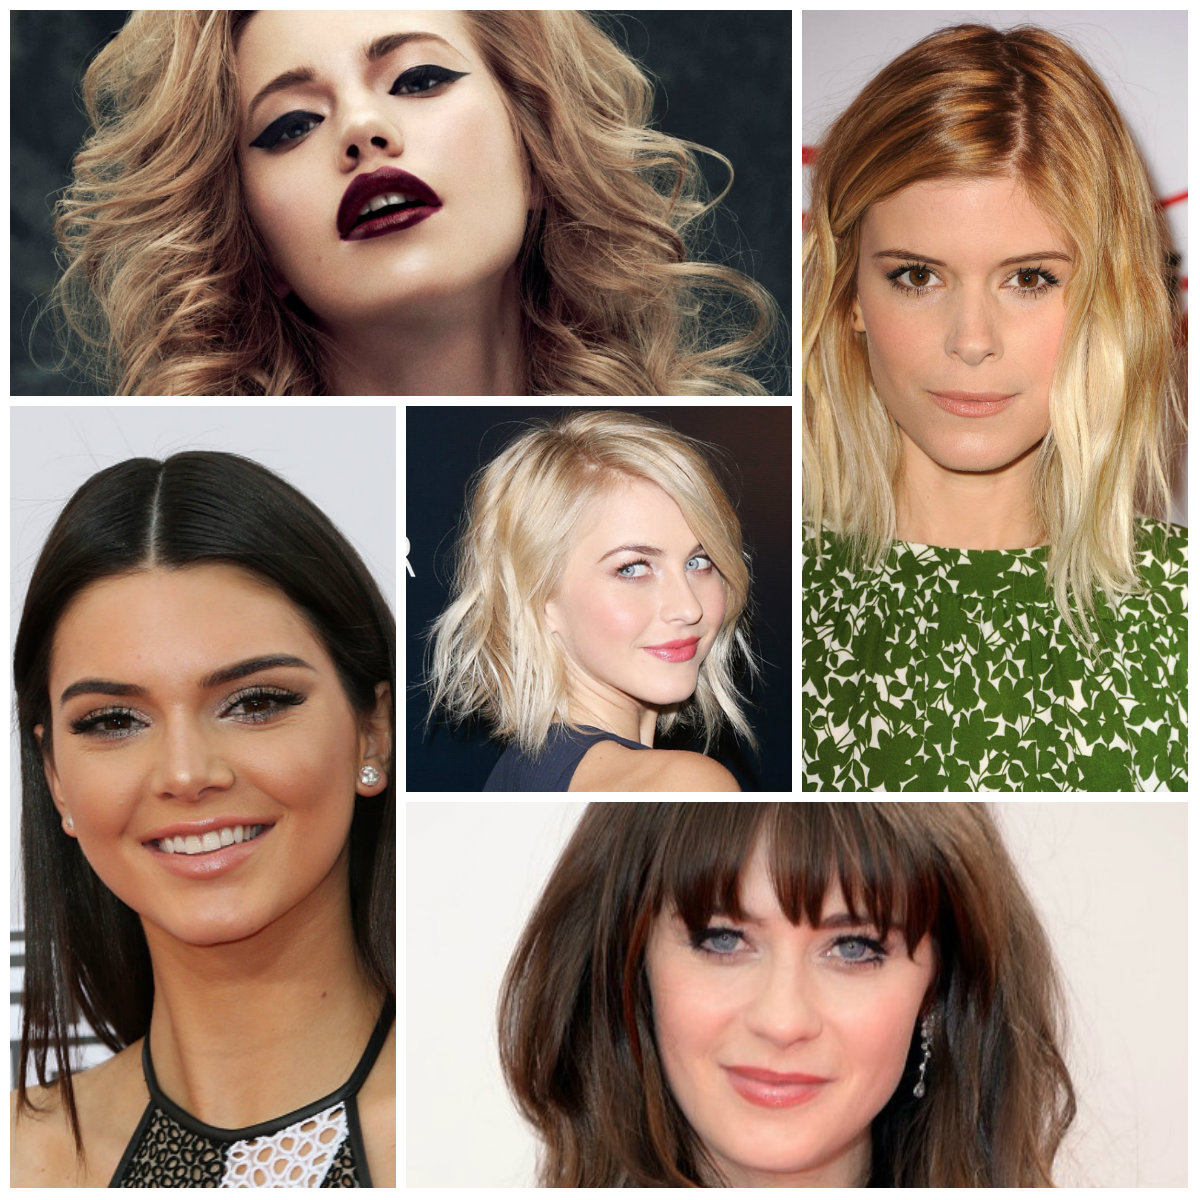 Top 5 Frisuren Frauen werden Neu rocken